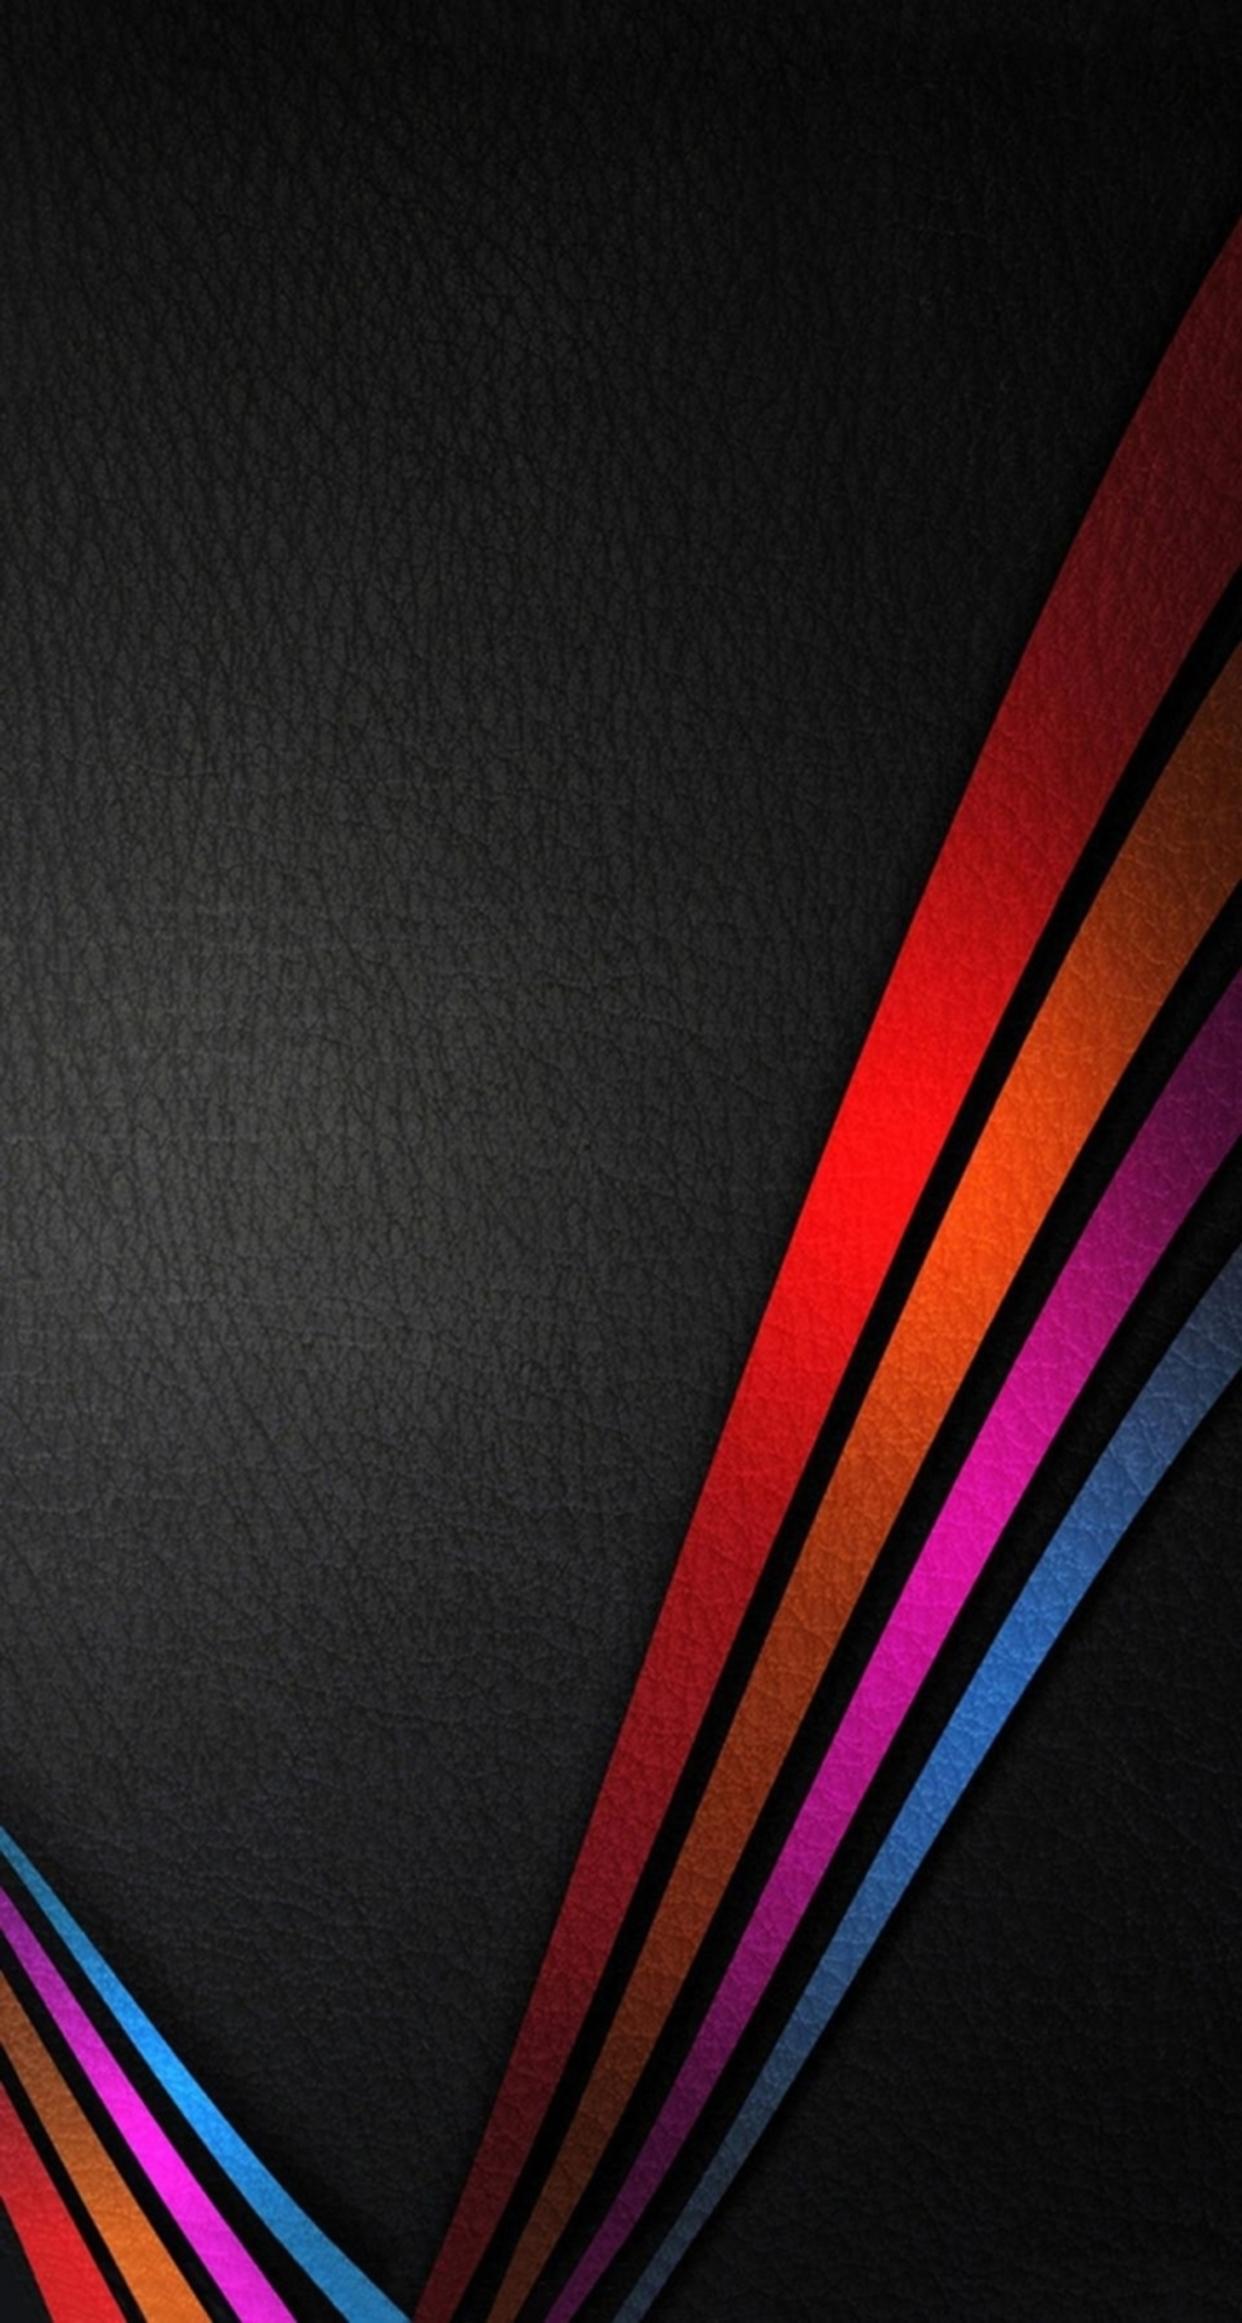 iPhone 7 Plus Wallpaper 1242x2323